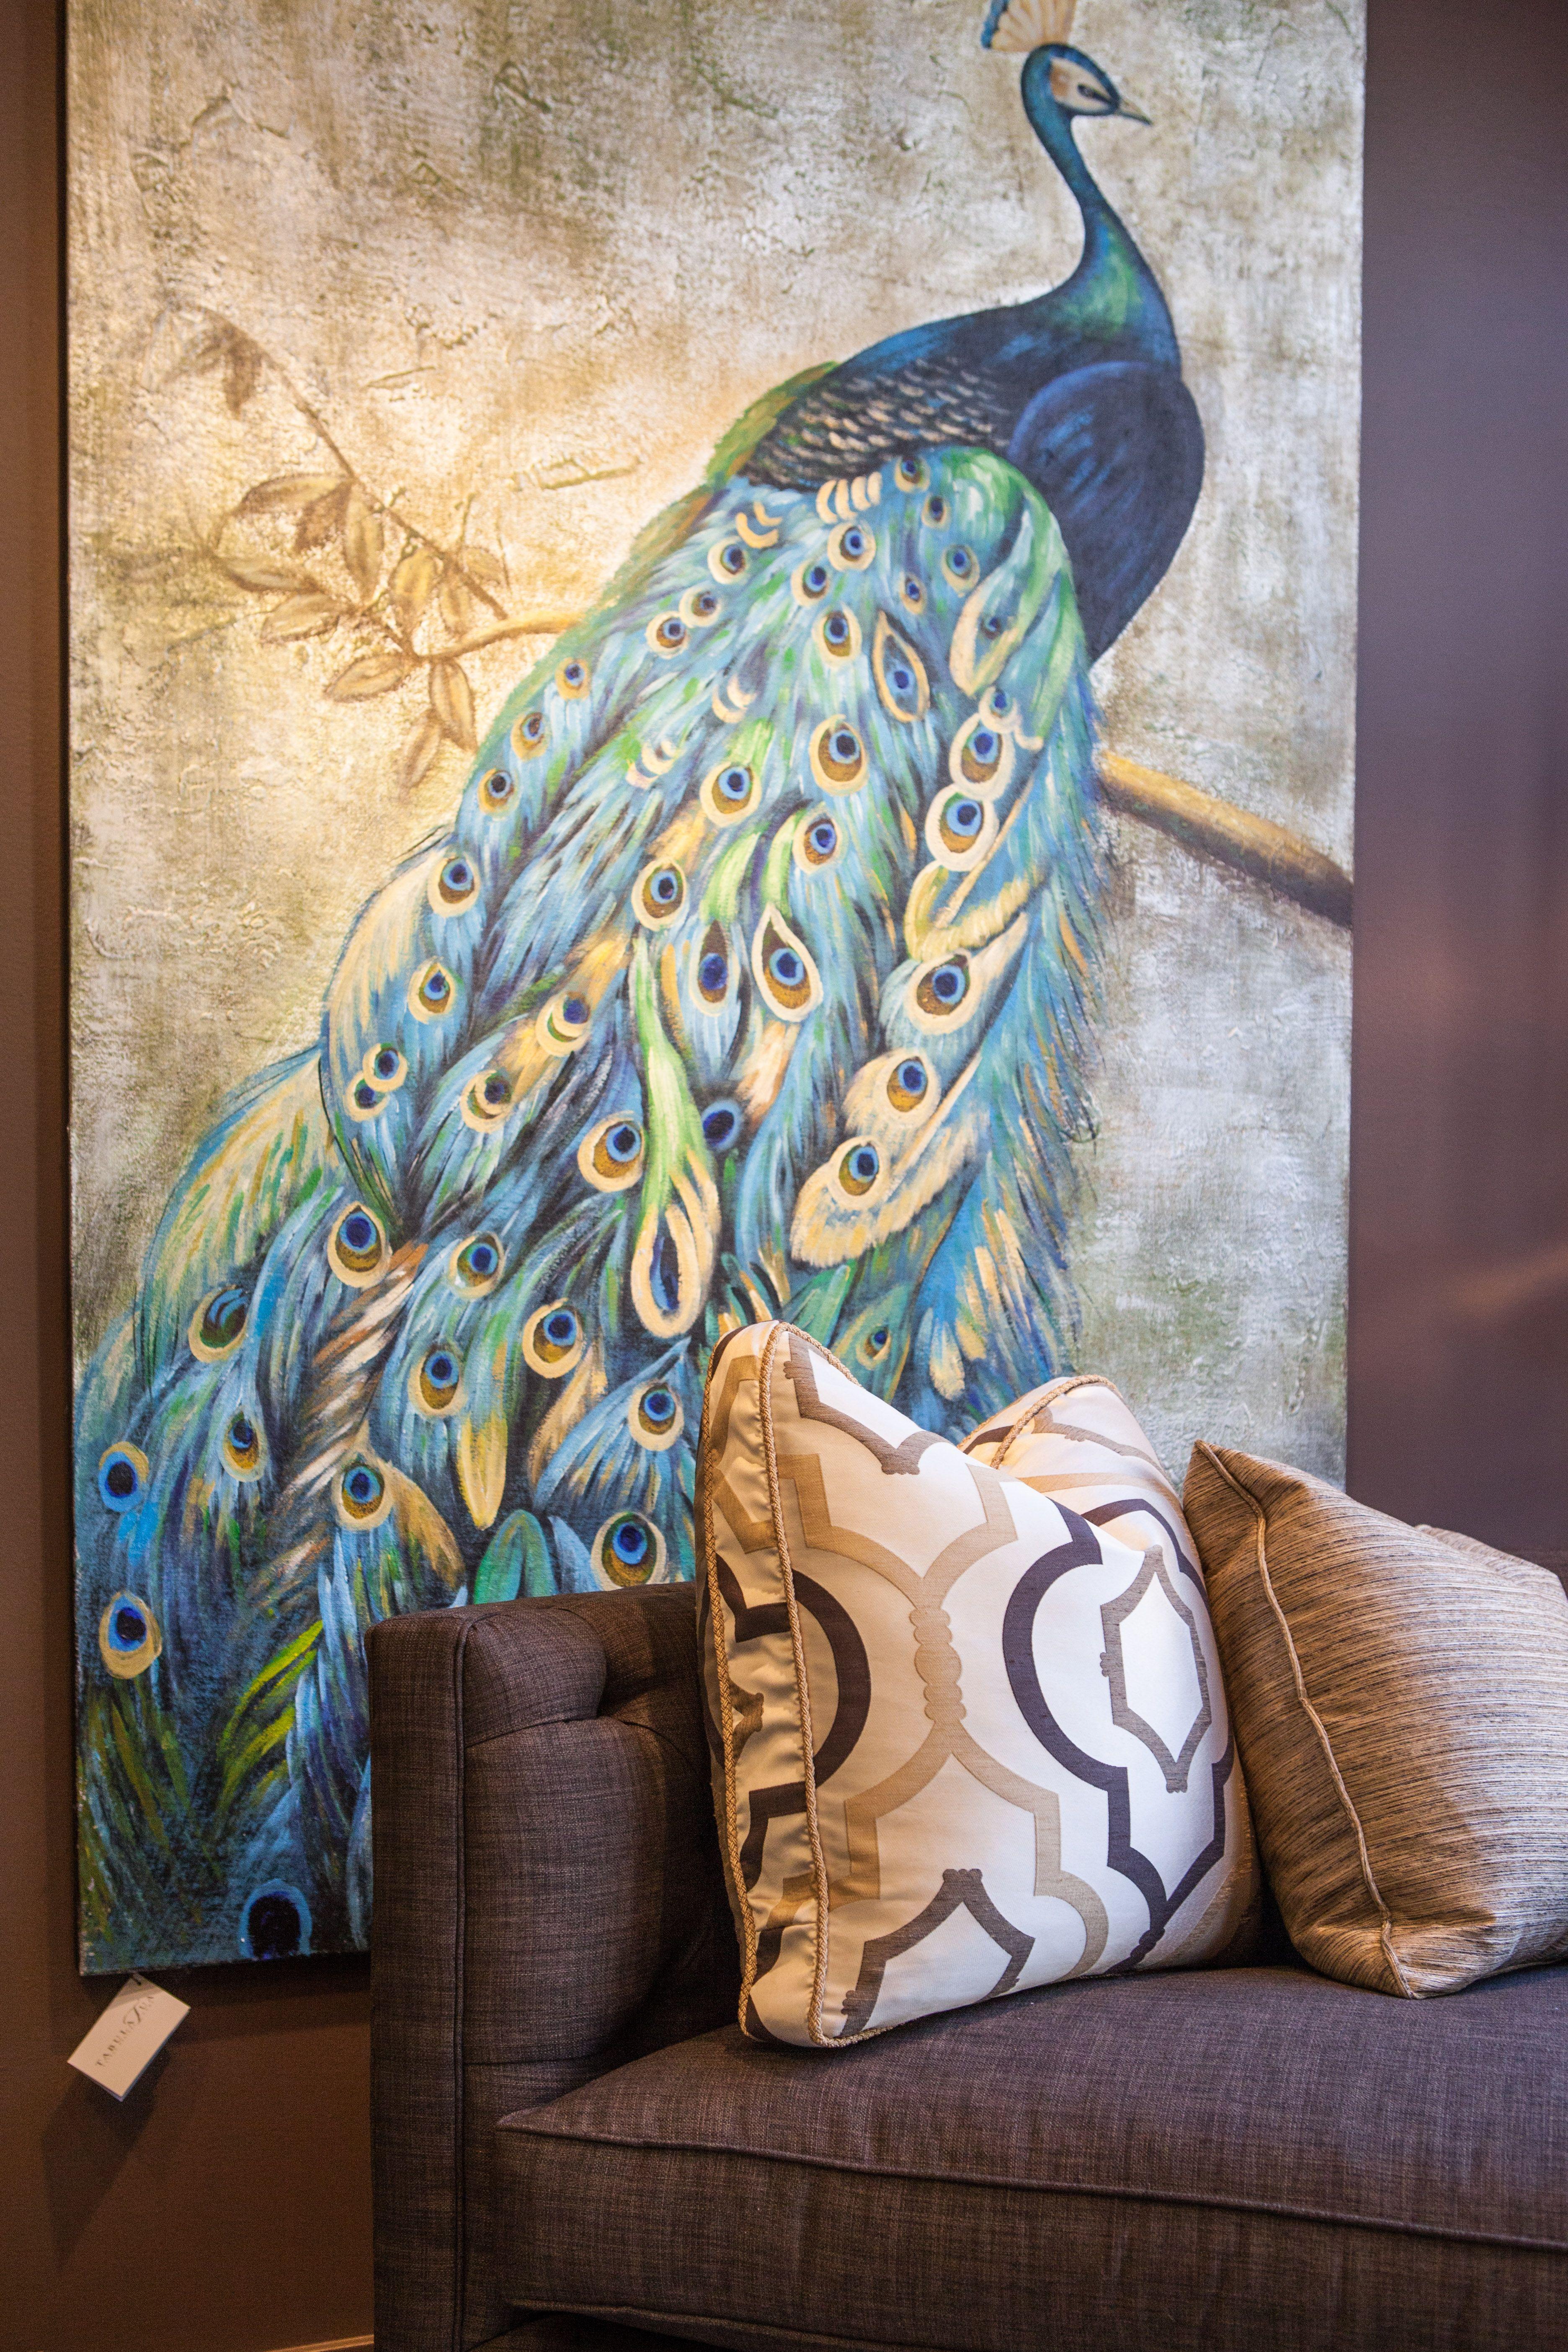 Peacock Painting At Tabula Tua 1015 W Armitage Avenue Chicago